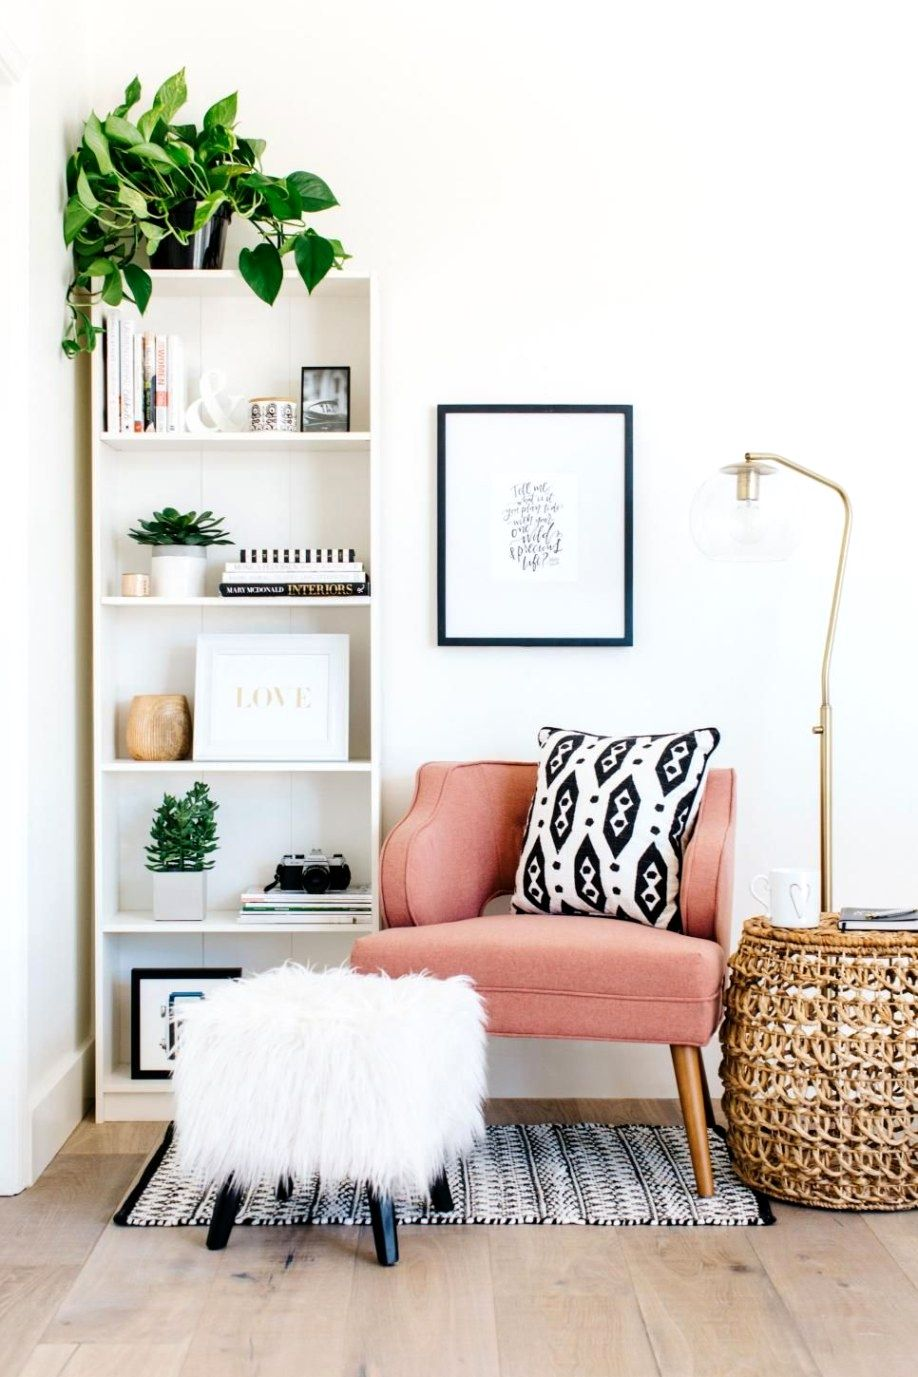 Remarkable Creative Concepts With Regards To Home Improvment Home Improvement Market Home Interior Design Home Decor Room Decor